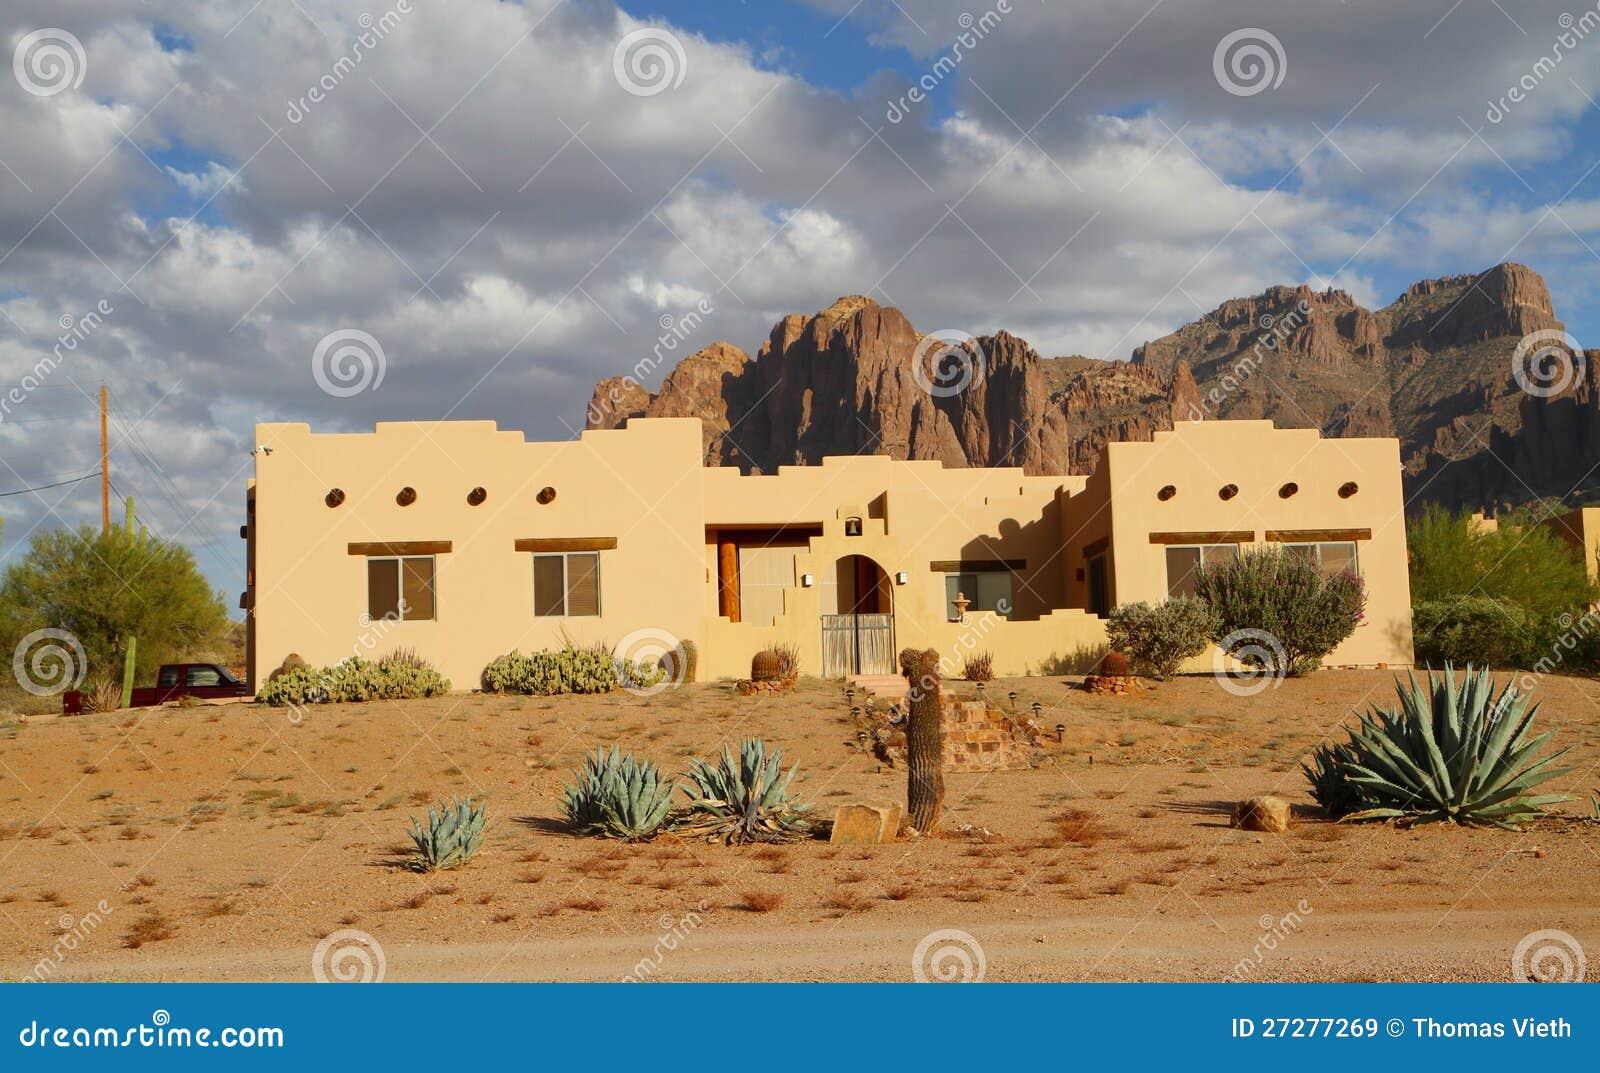 Usa Arizona Adobe House In A Desert Royalty Free Stock